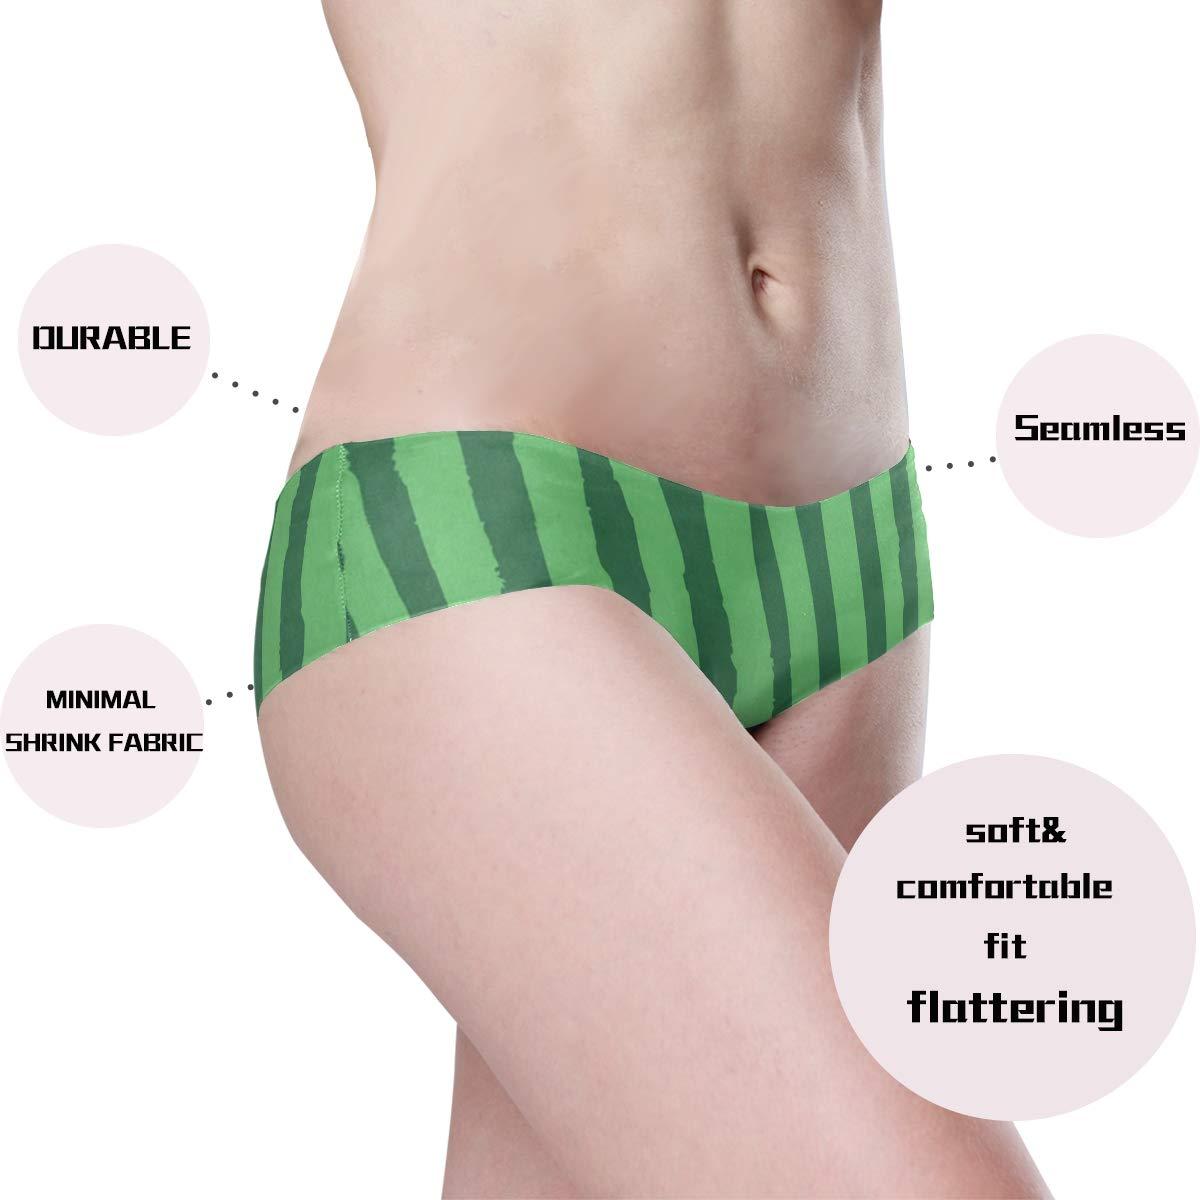 Watermelon Pattern Womens Underwear Seamless Cheeky Panties No Show Panty Lines